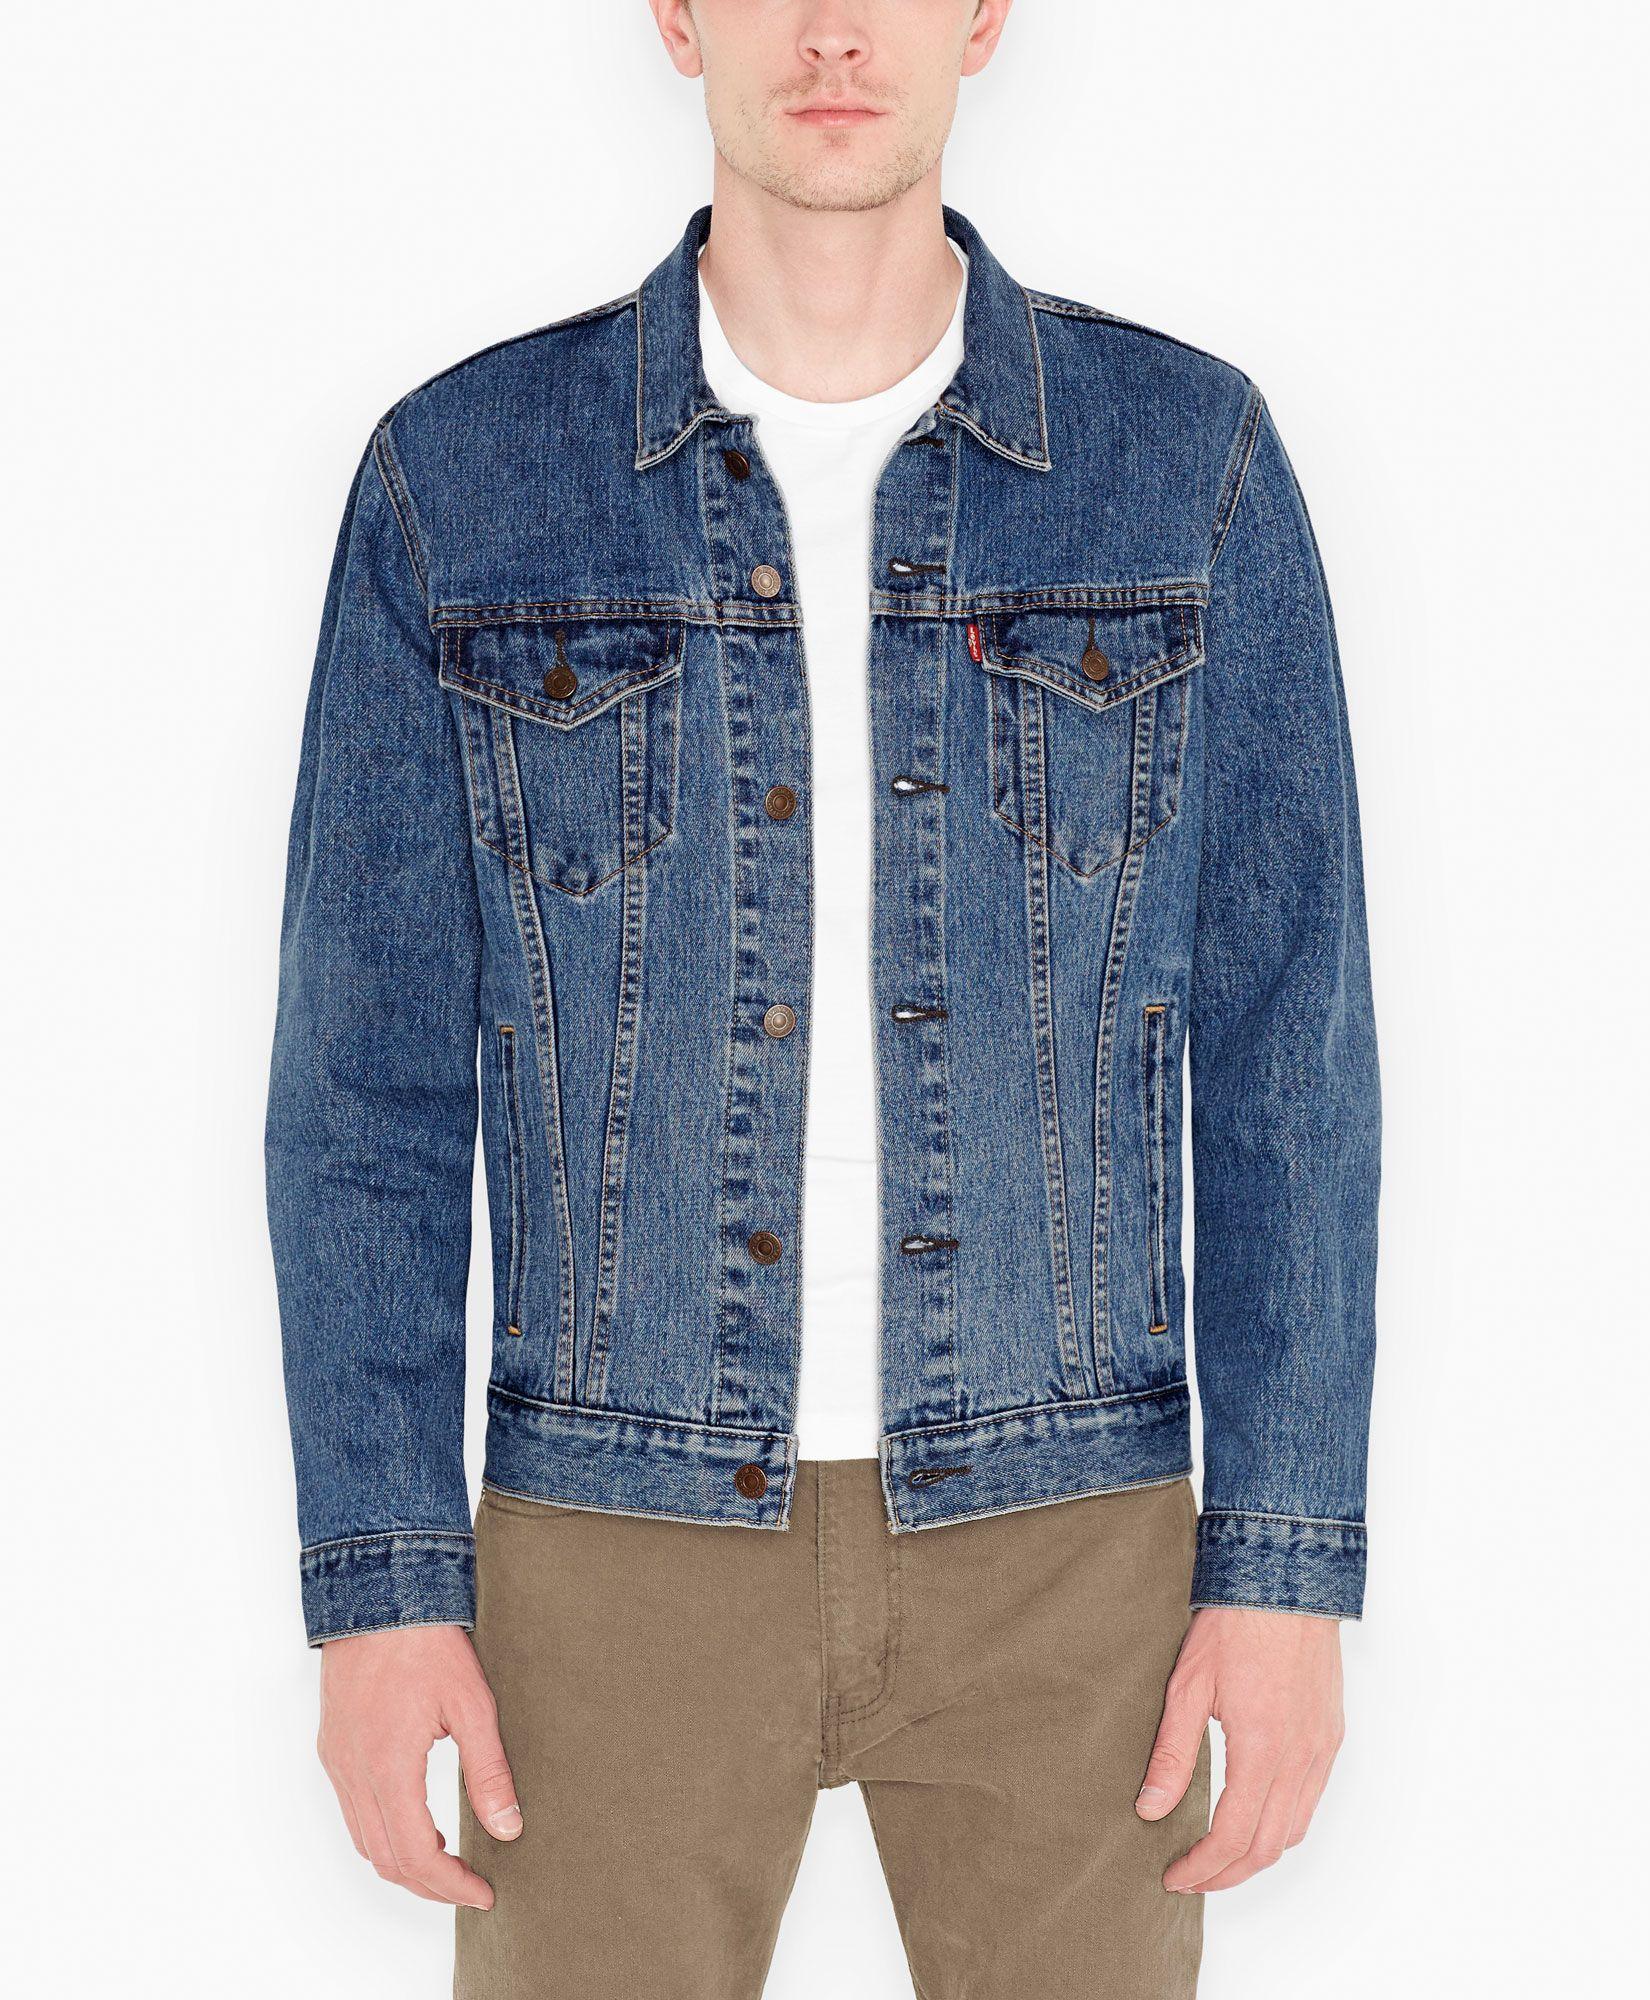 Trucker Jacket Denim Jacket Men Shop Mens Jeans Blue Jacket Men